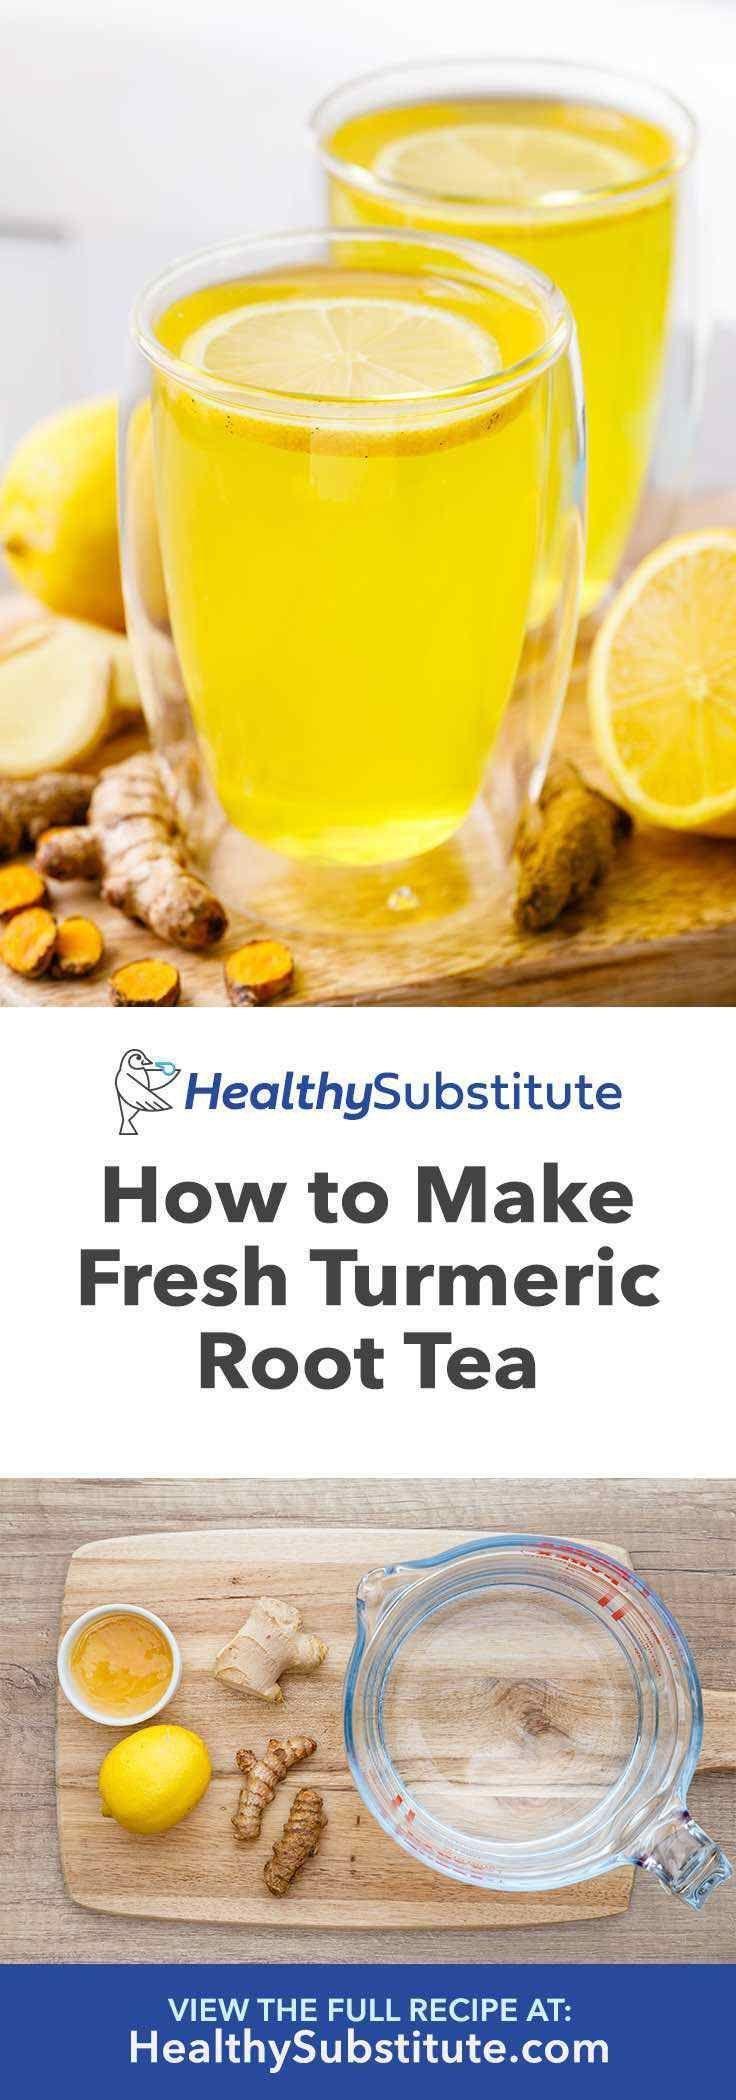 How To Make Fresh Turmeric Tea Using Fresh Turmeric Root Easy Healthy Substitute Wickedspatula Paleo Paleorecipes Lowcarb Lowcarbrecipes Coles Cuisine